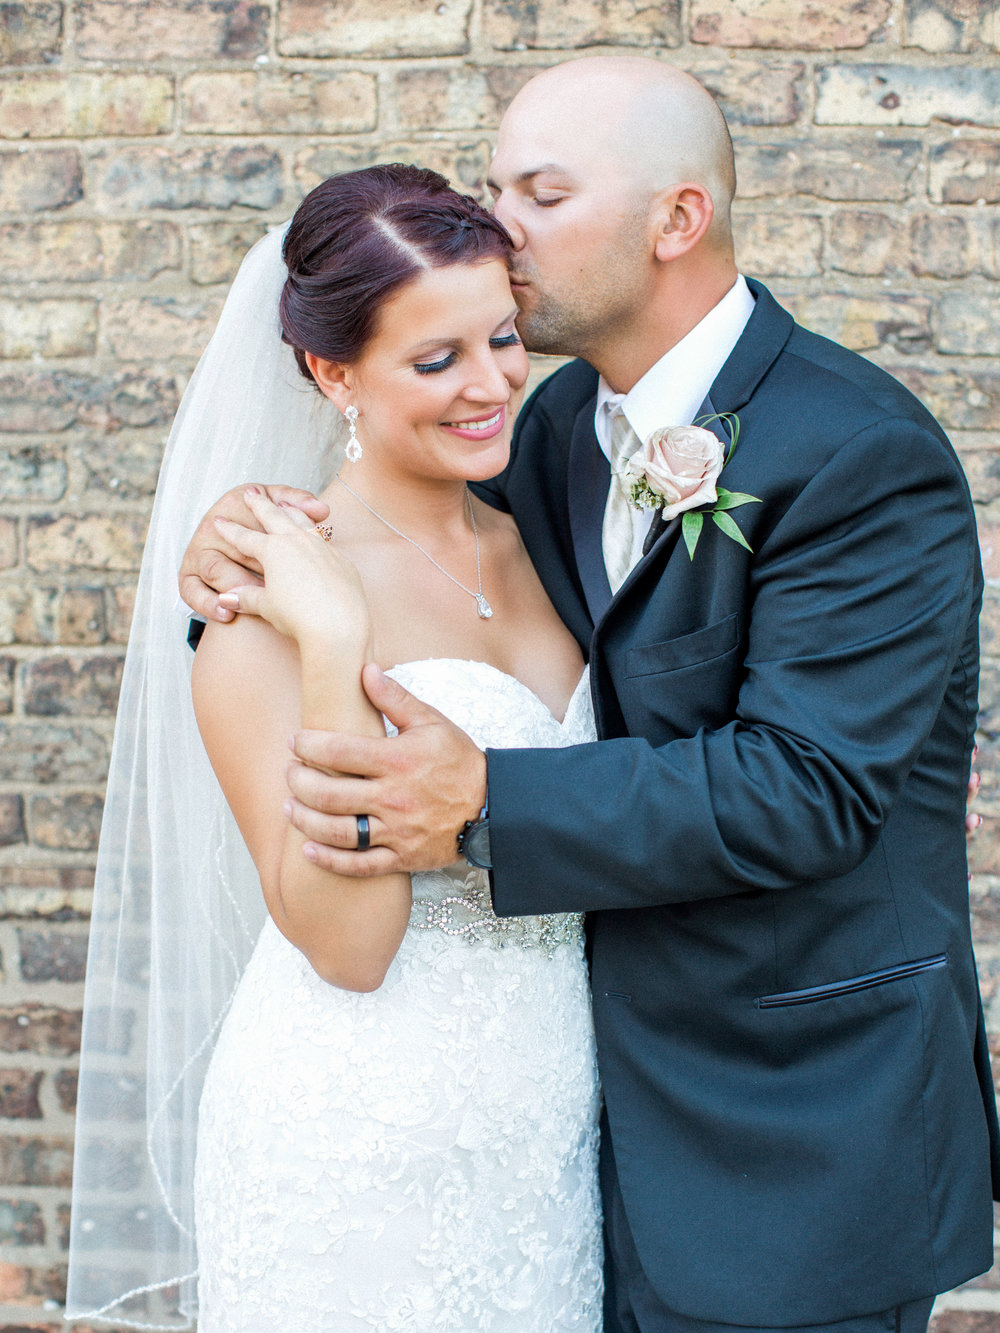 Lisa Silva Photography- Jacksonville, Florida Fine Art Film Wedding Photography (182 of 203).jpg